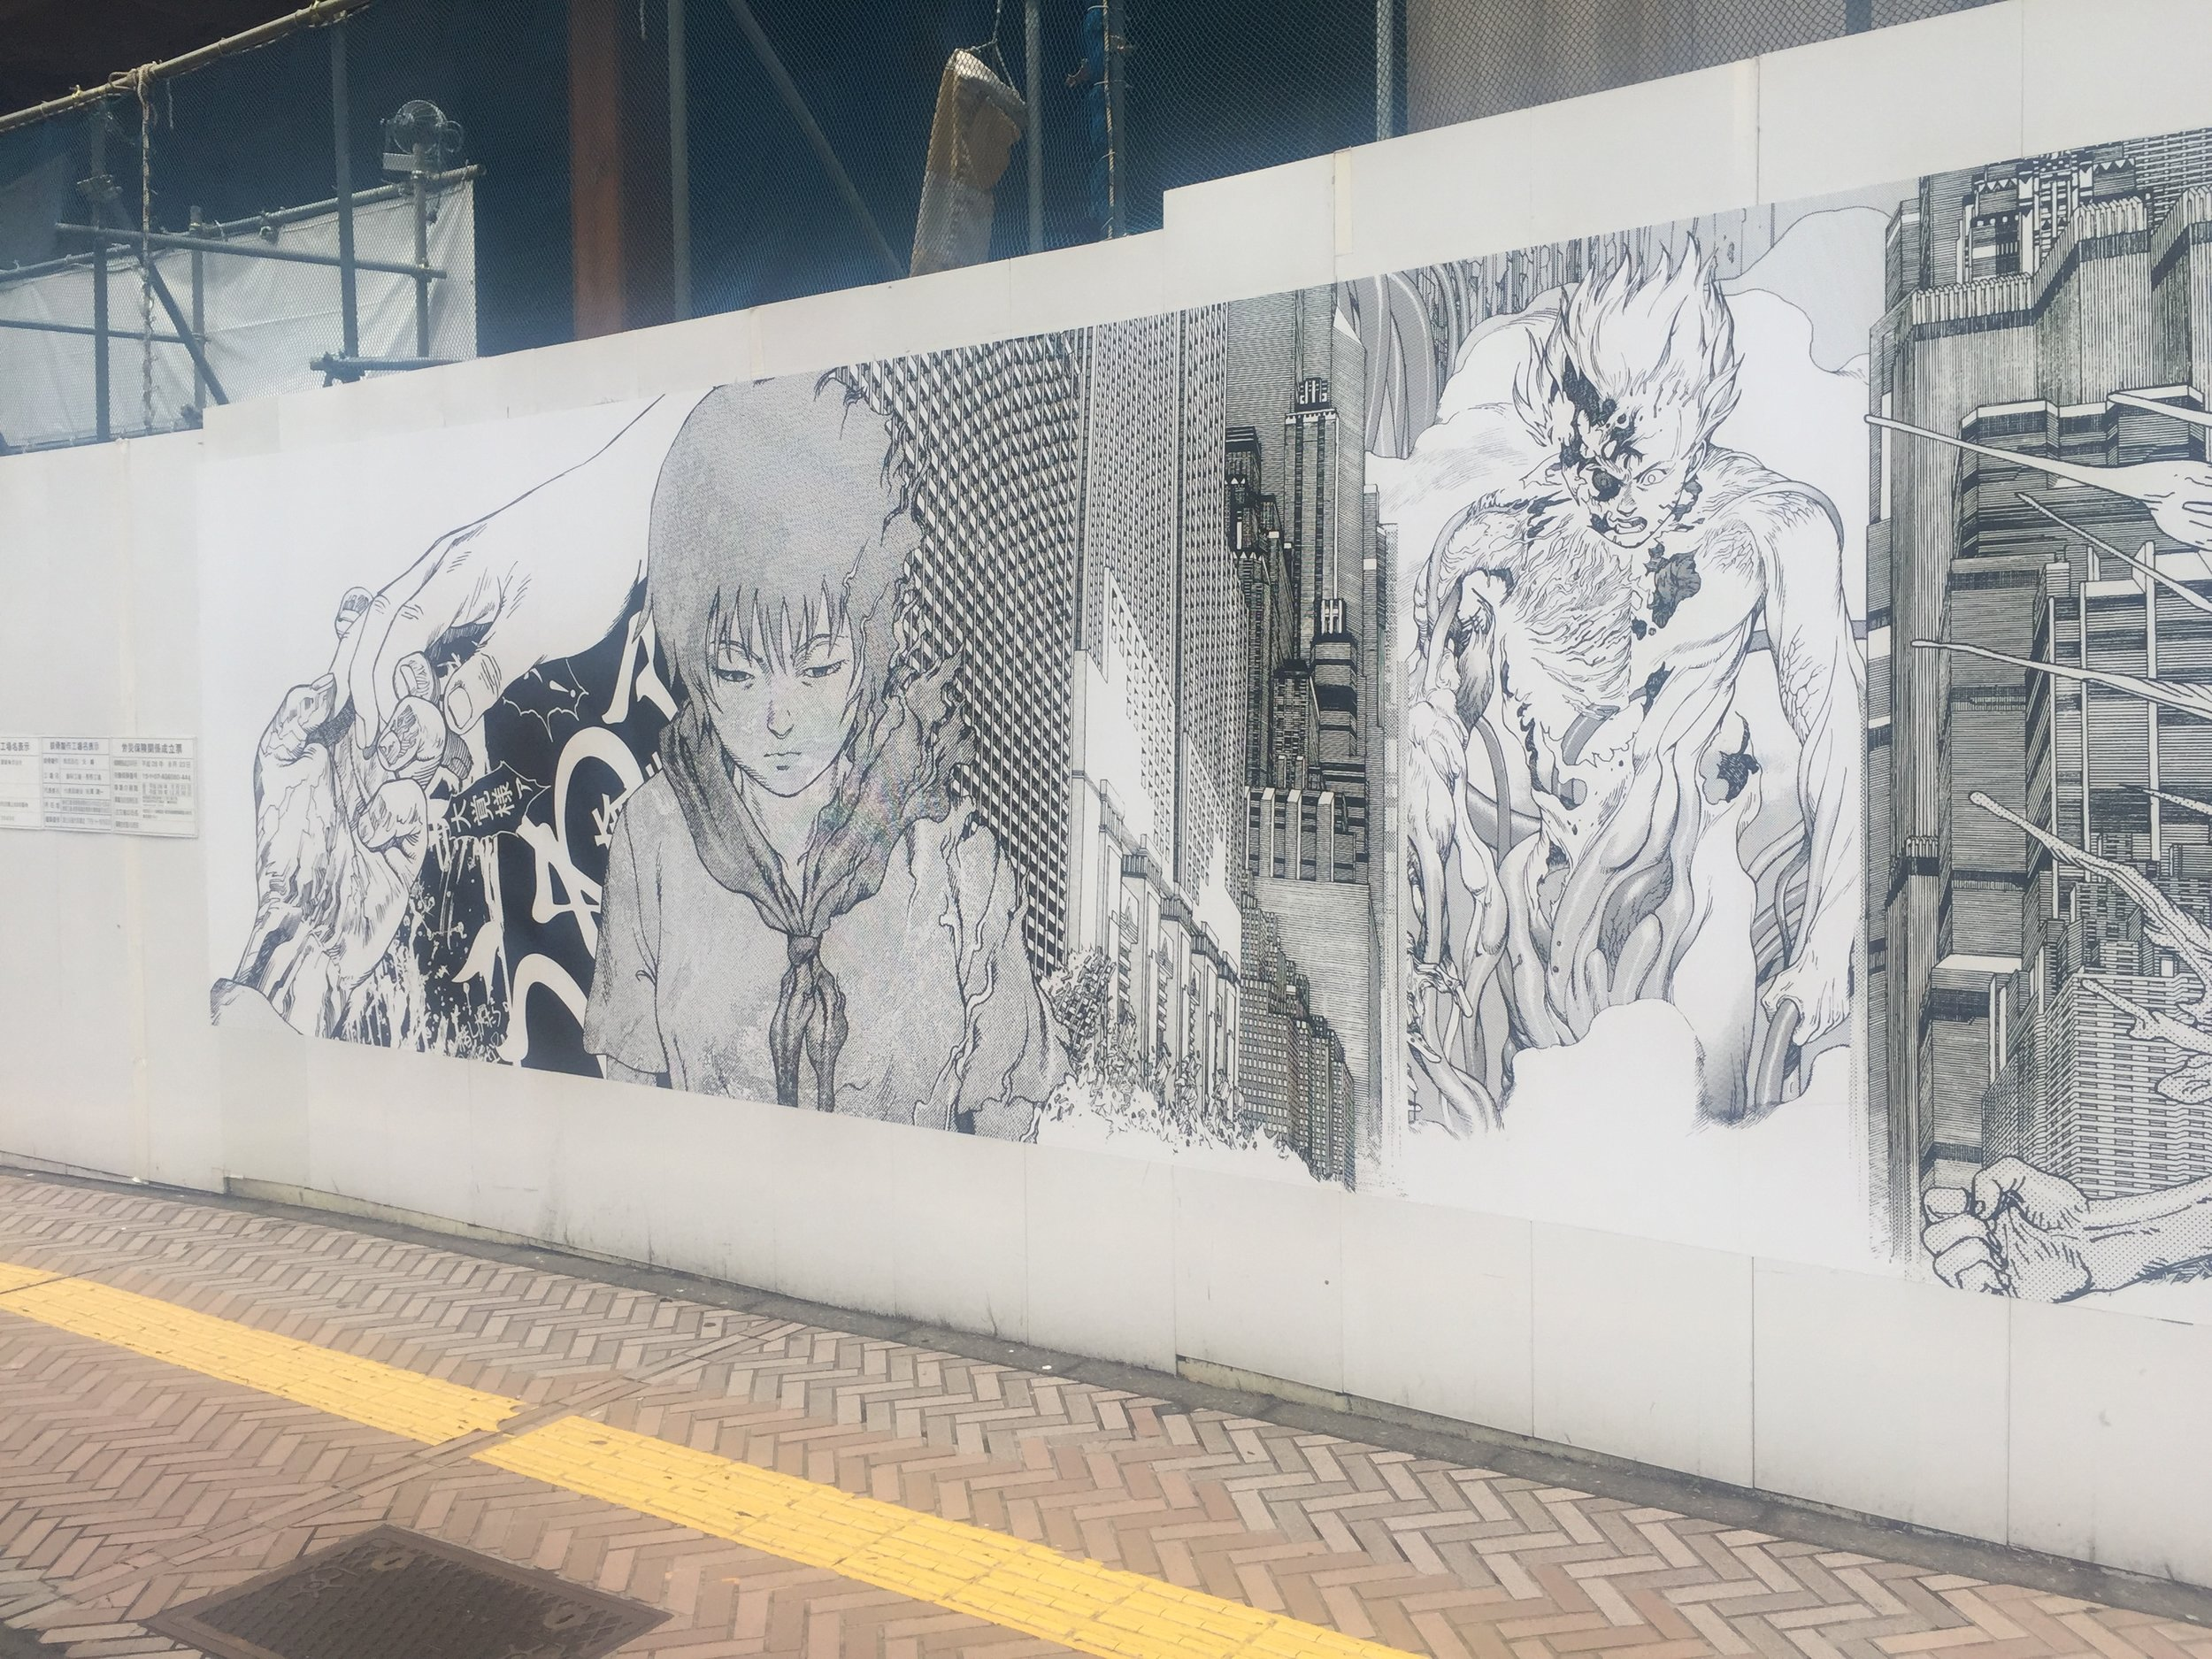 akira comic display shibuya tokyo.JPG